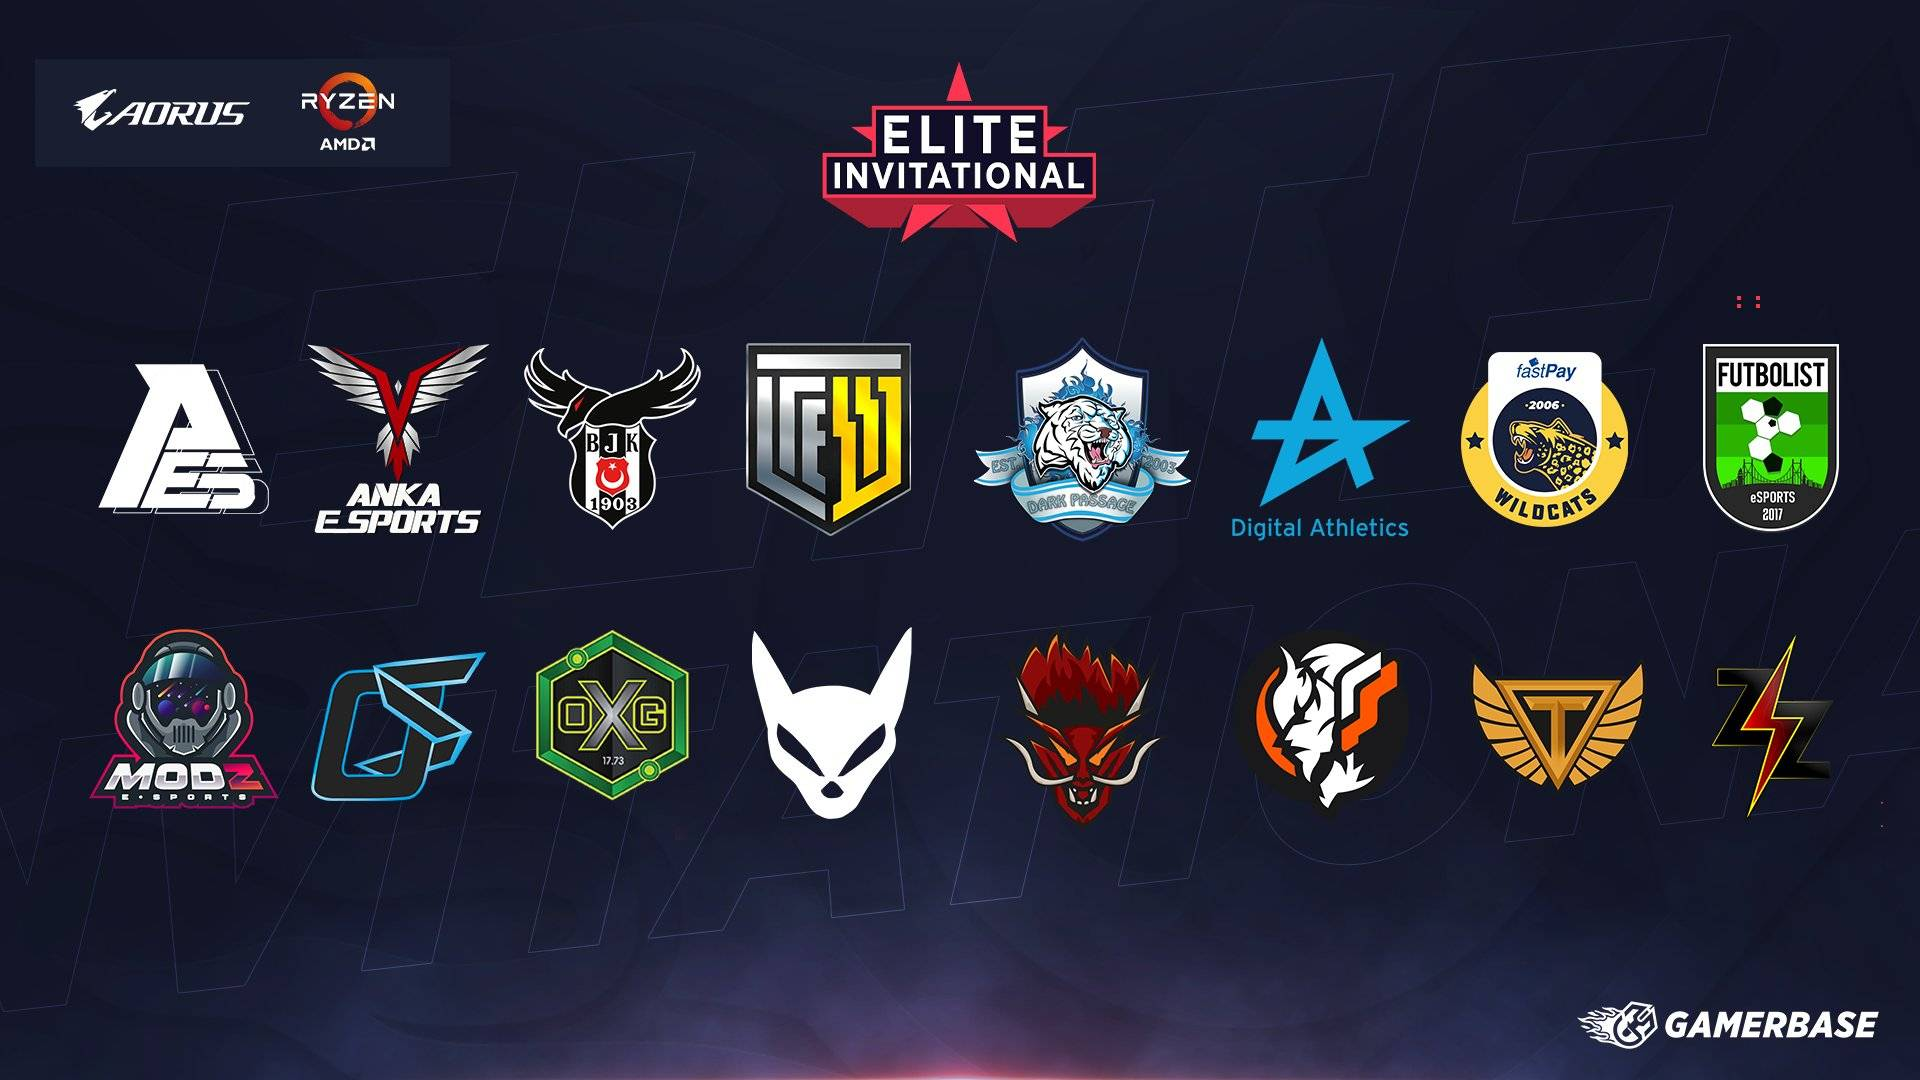 Elite Invitational